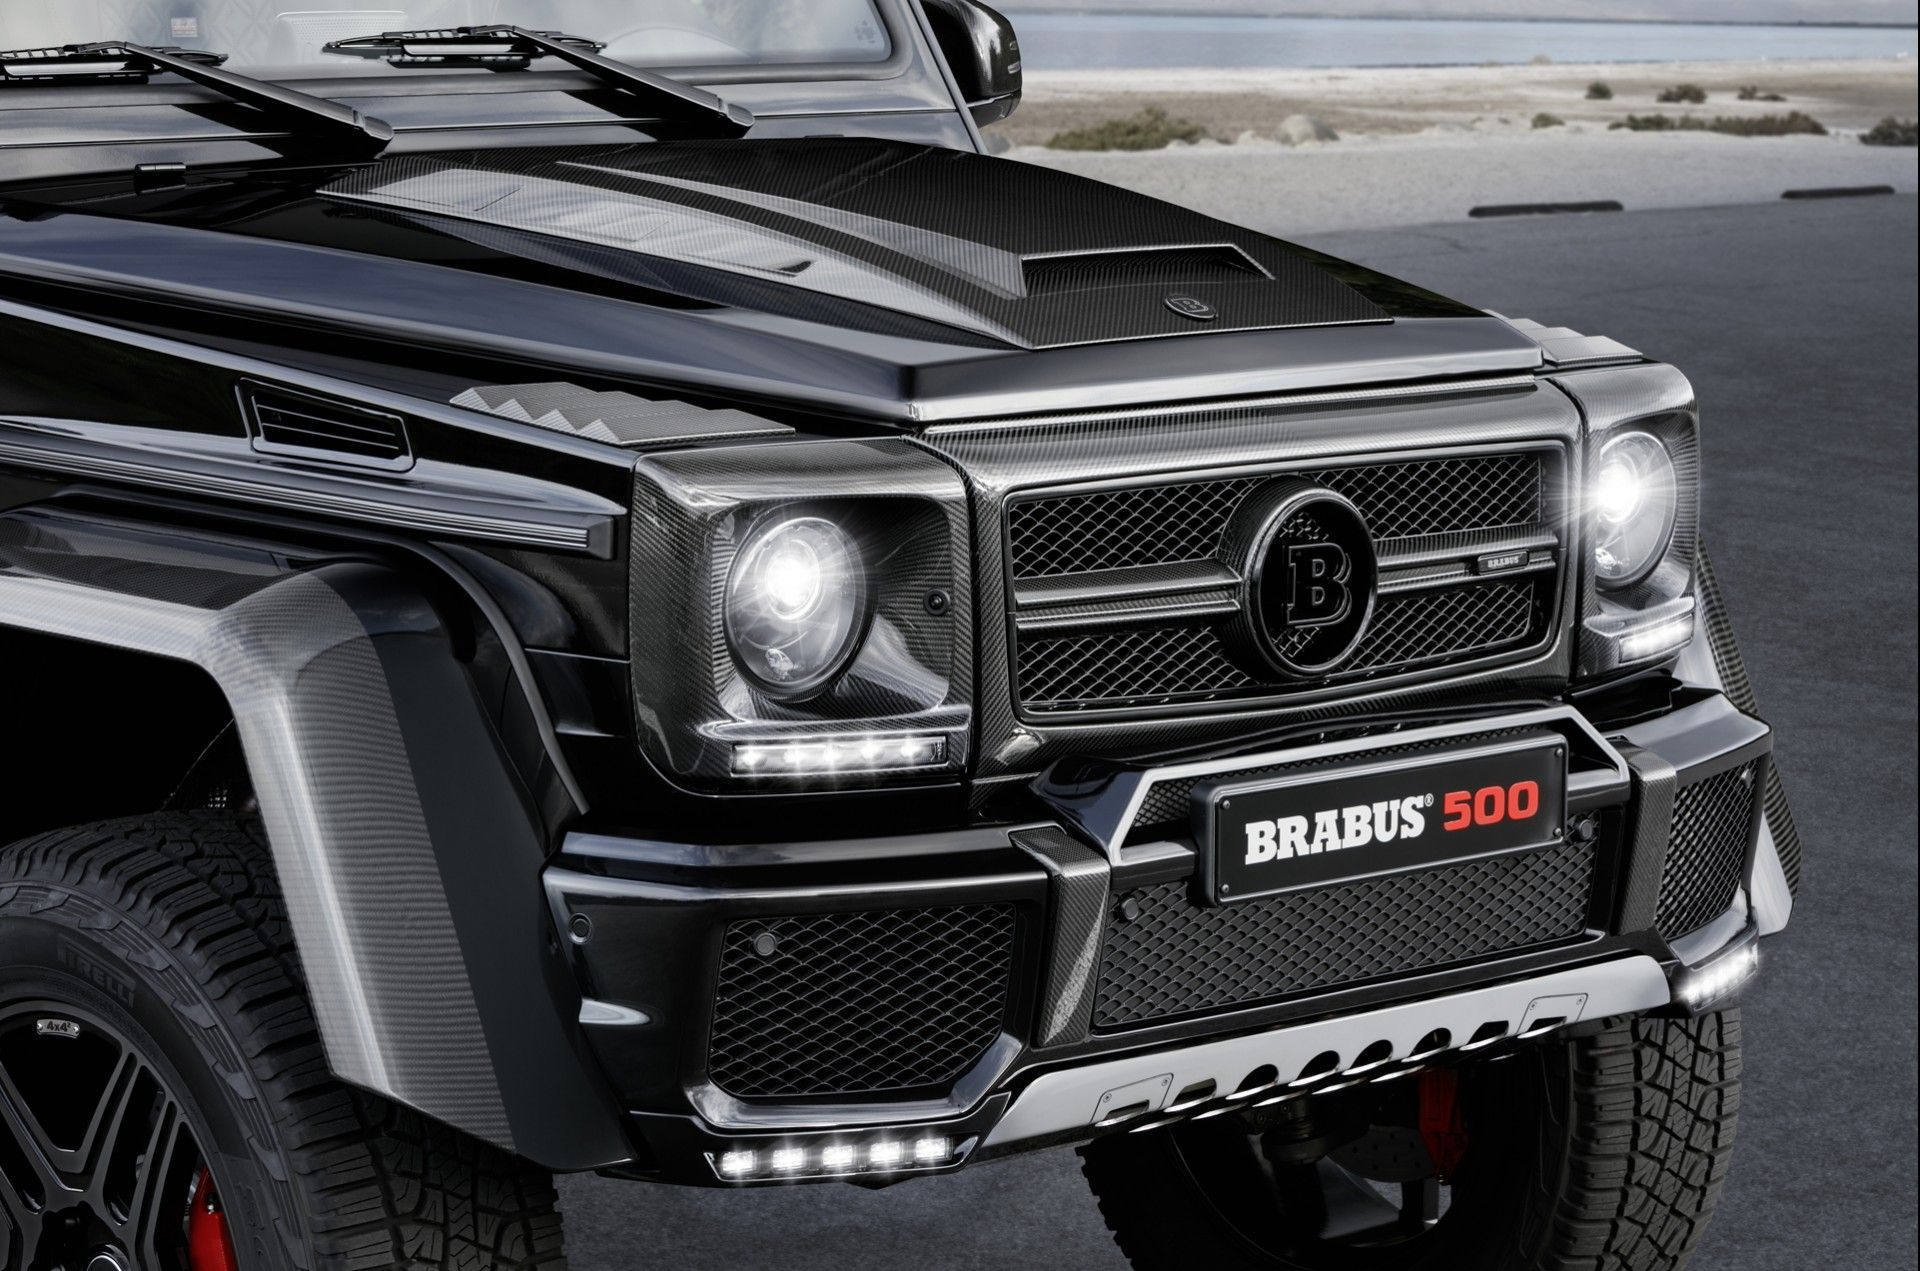 Brabus G500 4x4 Mercedes G500 Mercedes Benz G500 Mercedes G